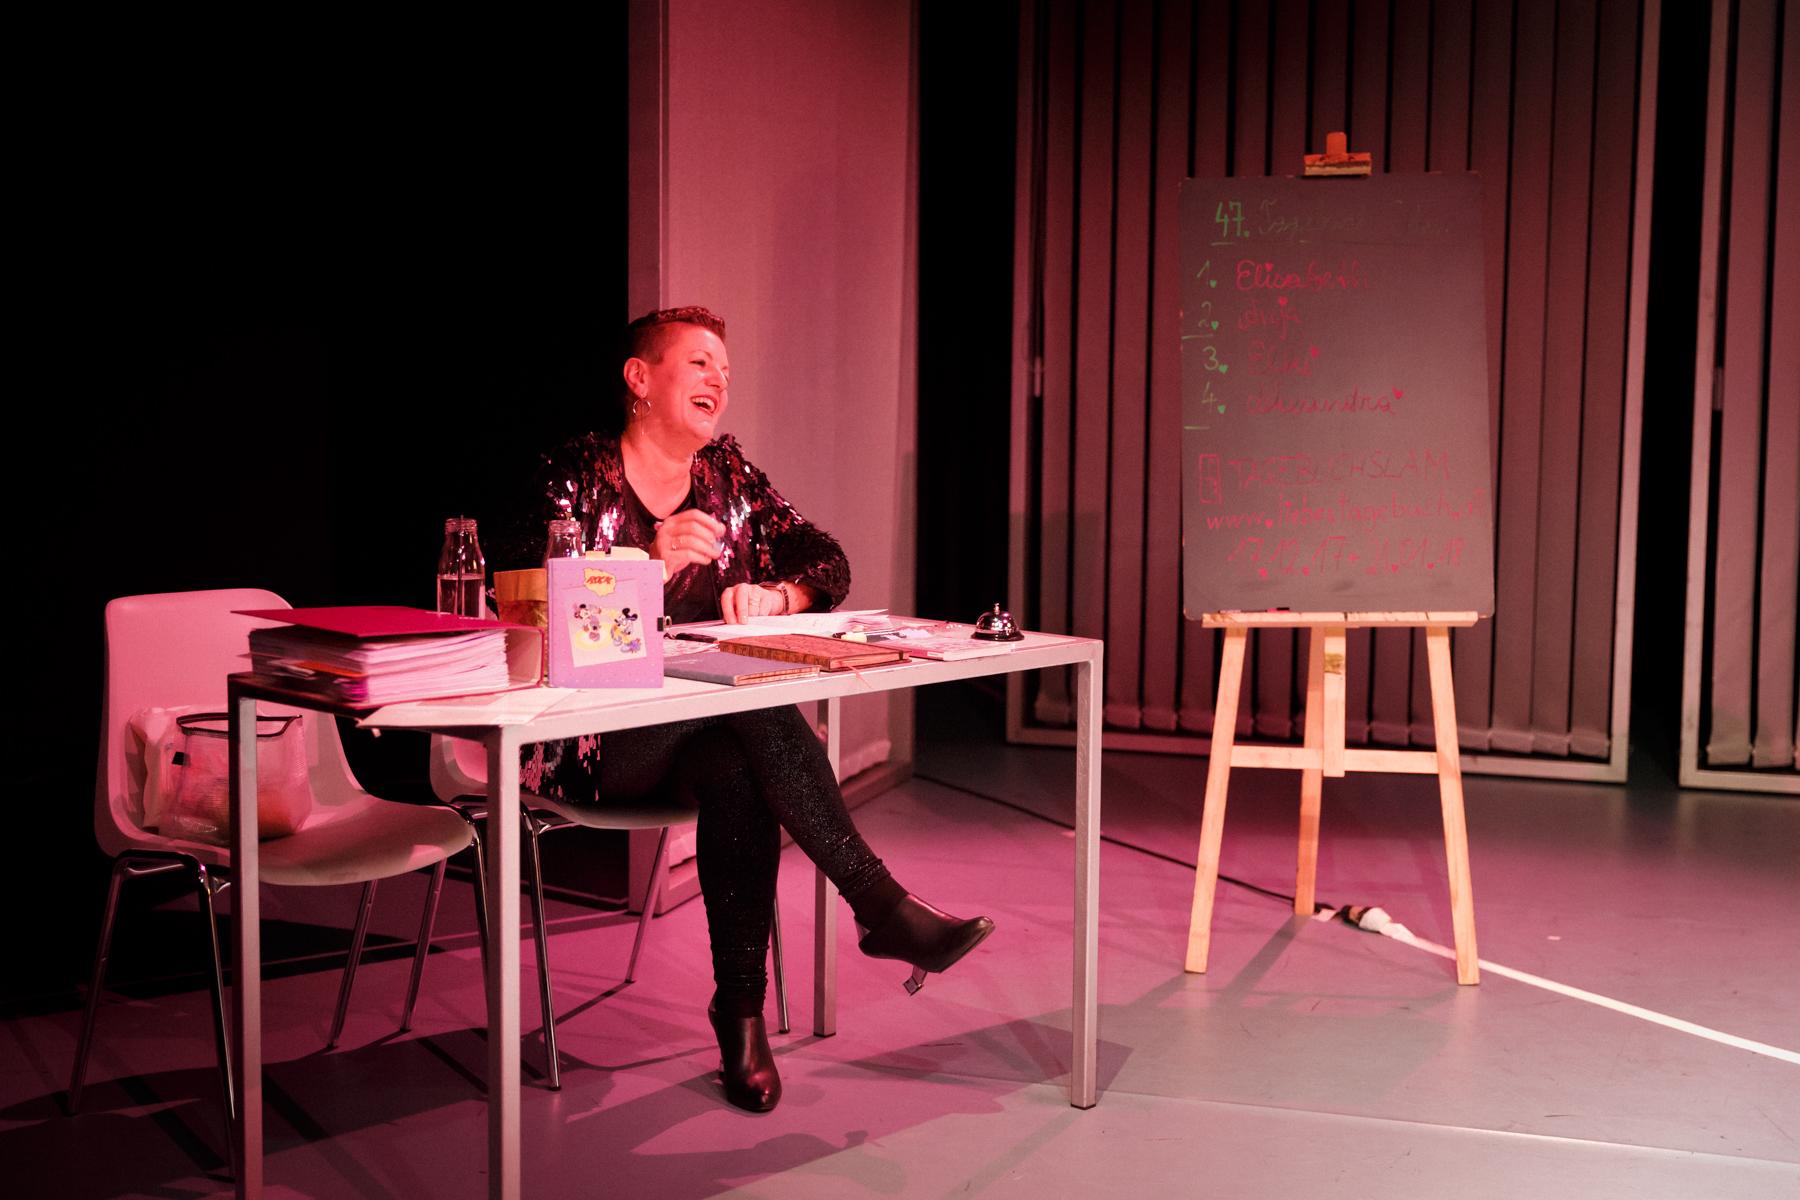 17-11-26 TAGebuch Slam Buchpräsentation_©anna konrath_15.jpg